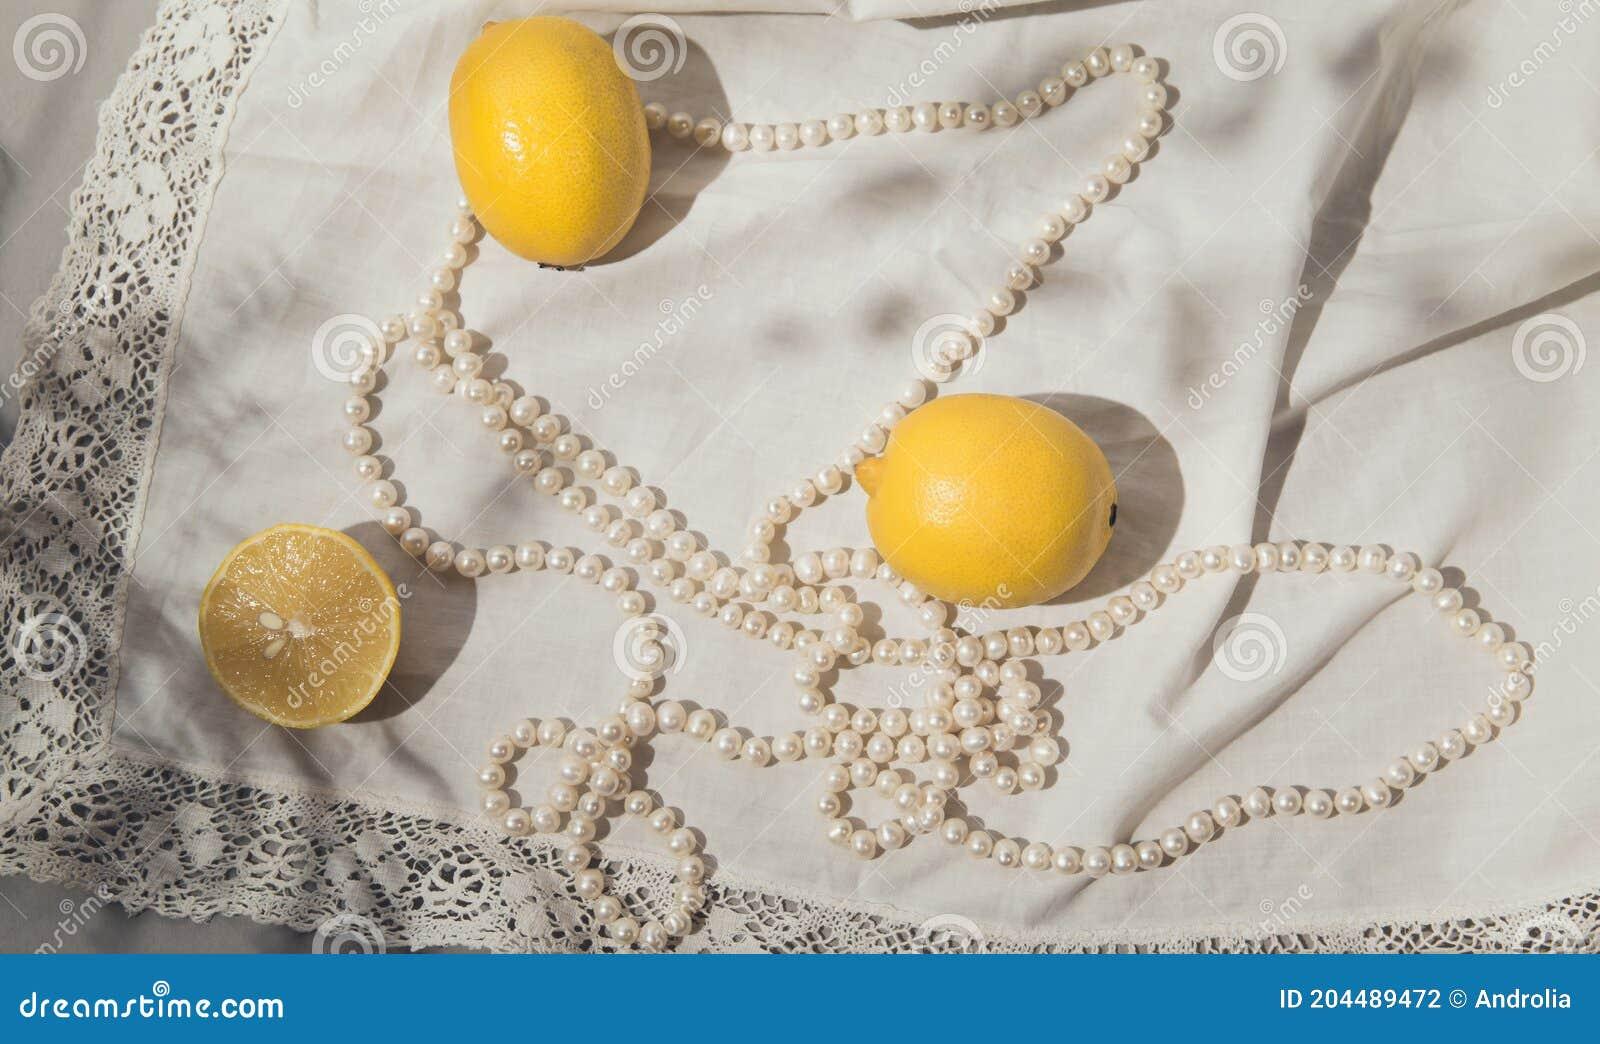 Fresh Lemons With Pearl Necklace On White Fabric Background With Shades Beautiful Backdrop Stock Photo Image Of Fabric Fashion 204489472